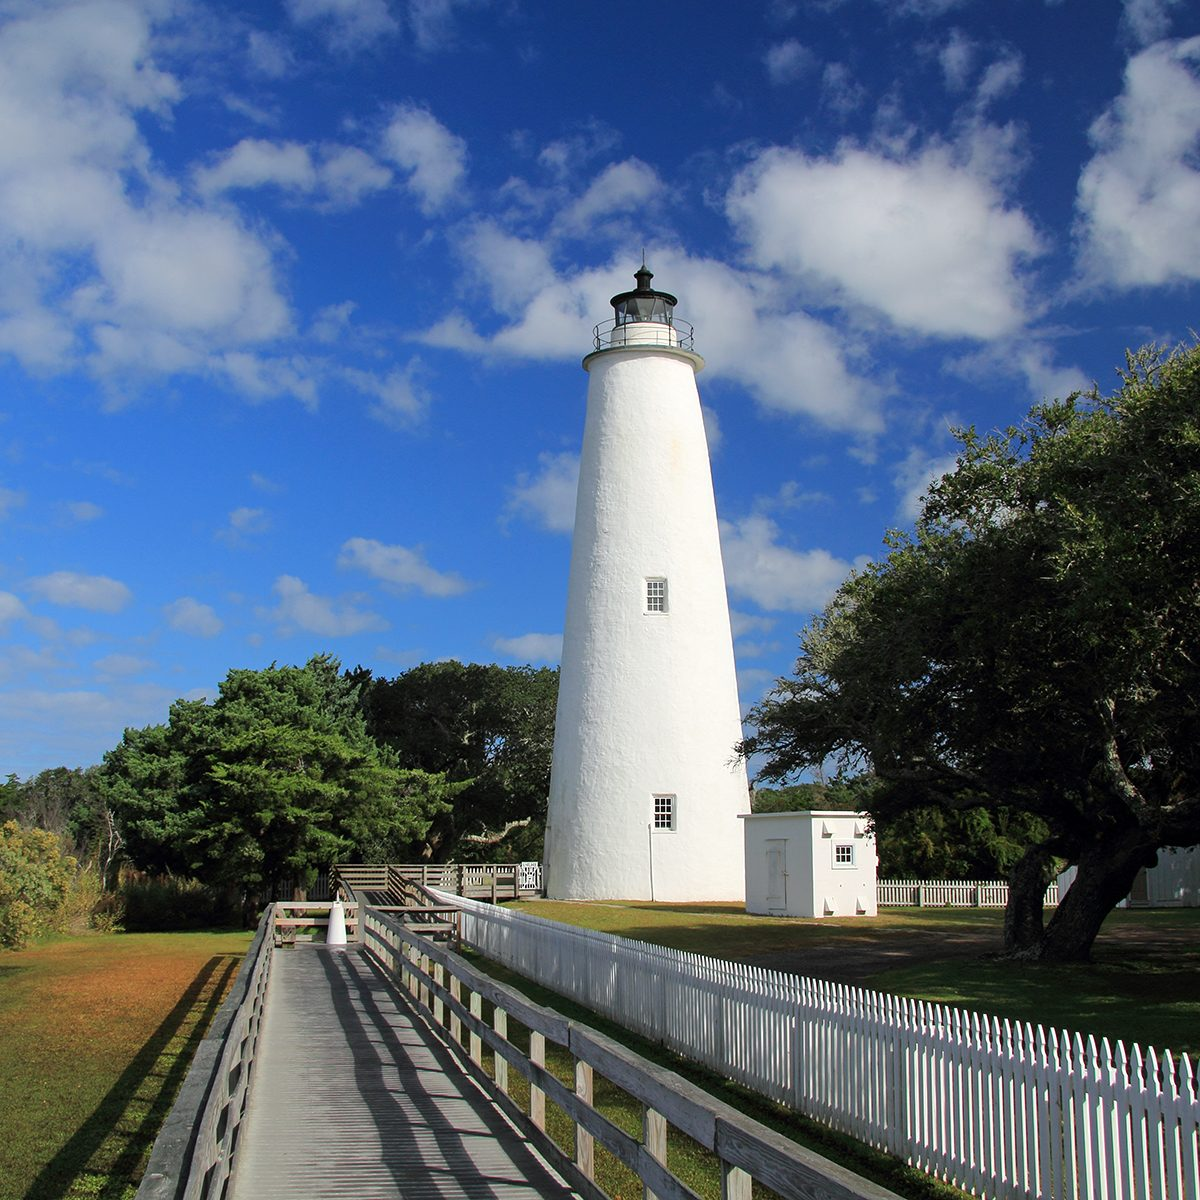 Historic Ocracoke Light on Ocracoke Island